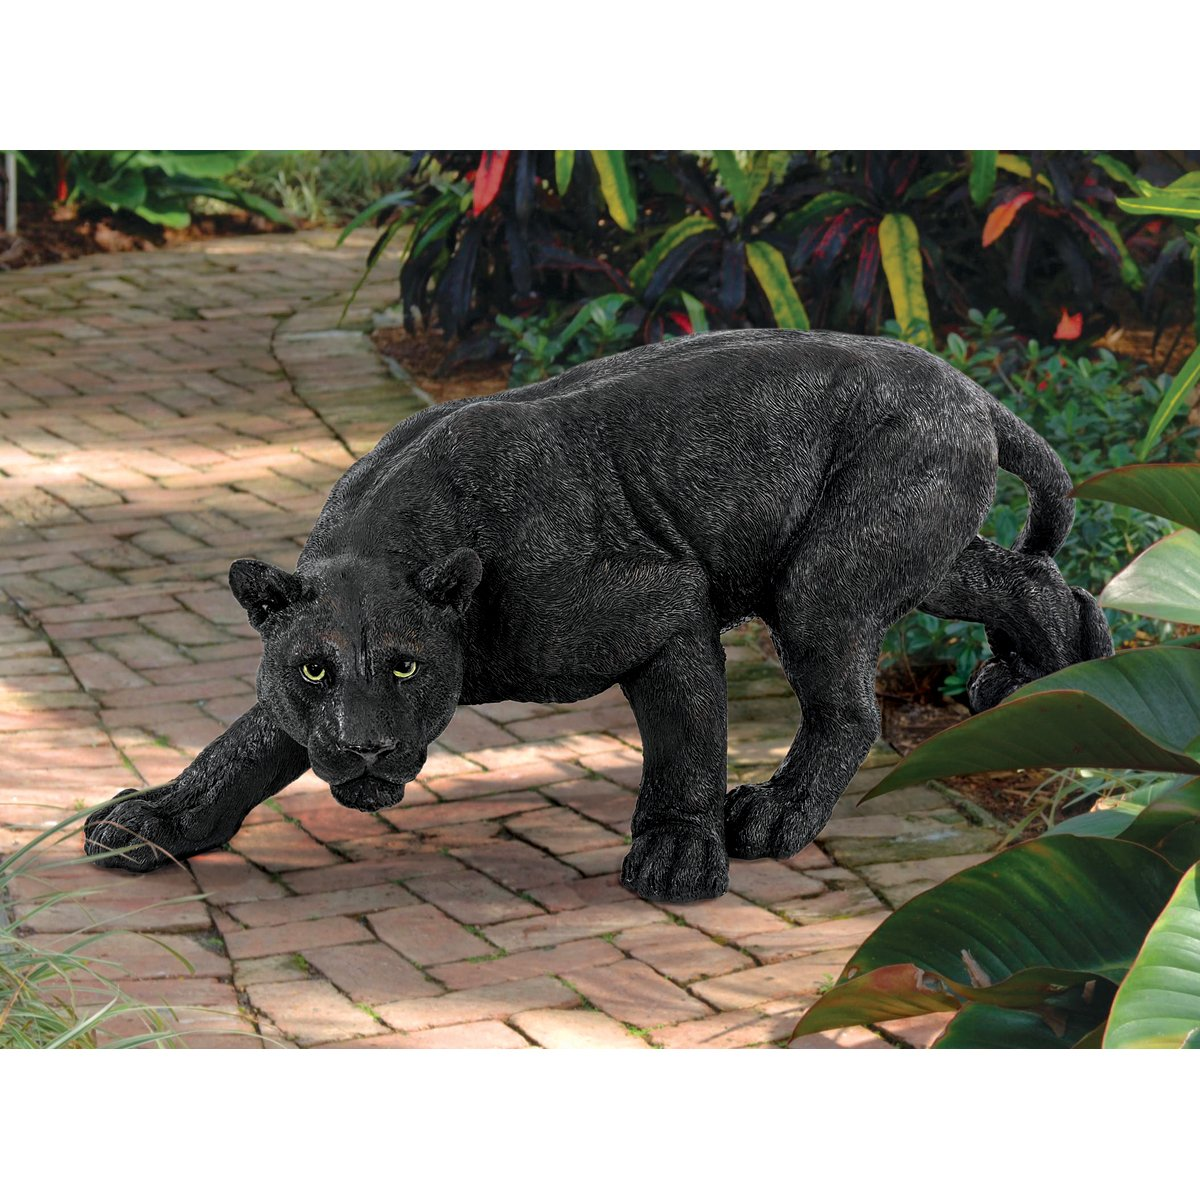 Amazon.com : Design Toscano Shadowed Predator Black Panther Garden Statue :  Punisher Statues : Garden U0026 Outdoor